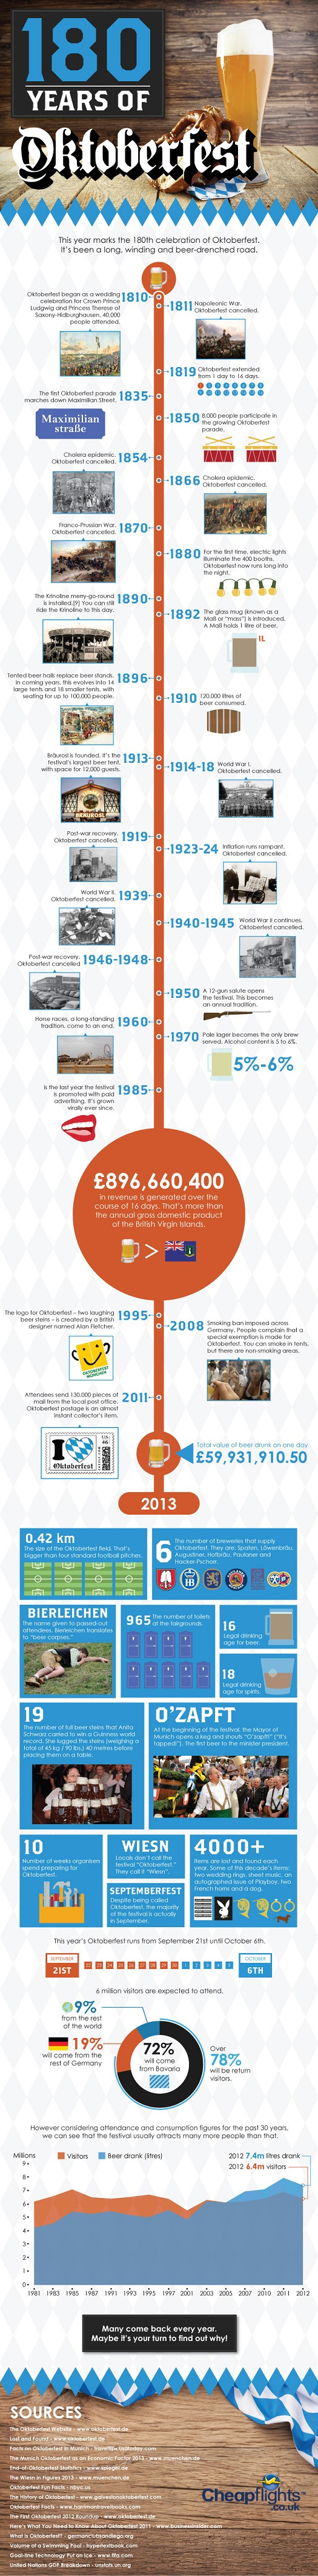 180-years-of-oktoberfest-infographic_525e6e2f979f1